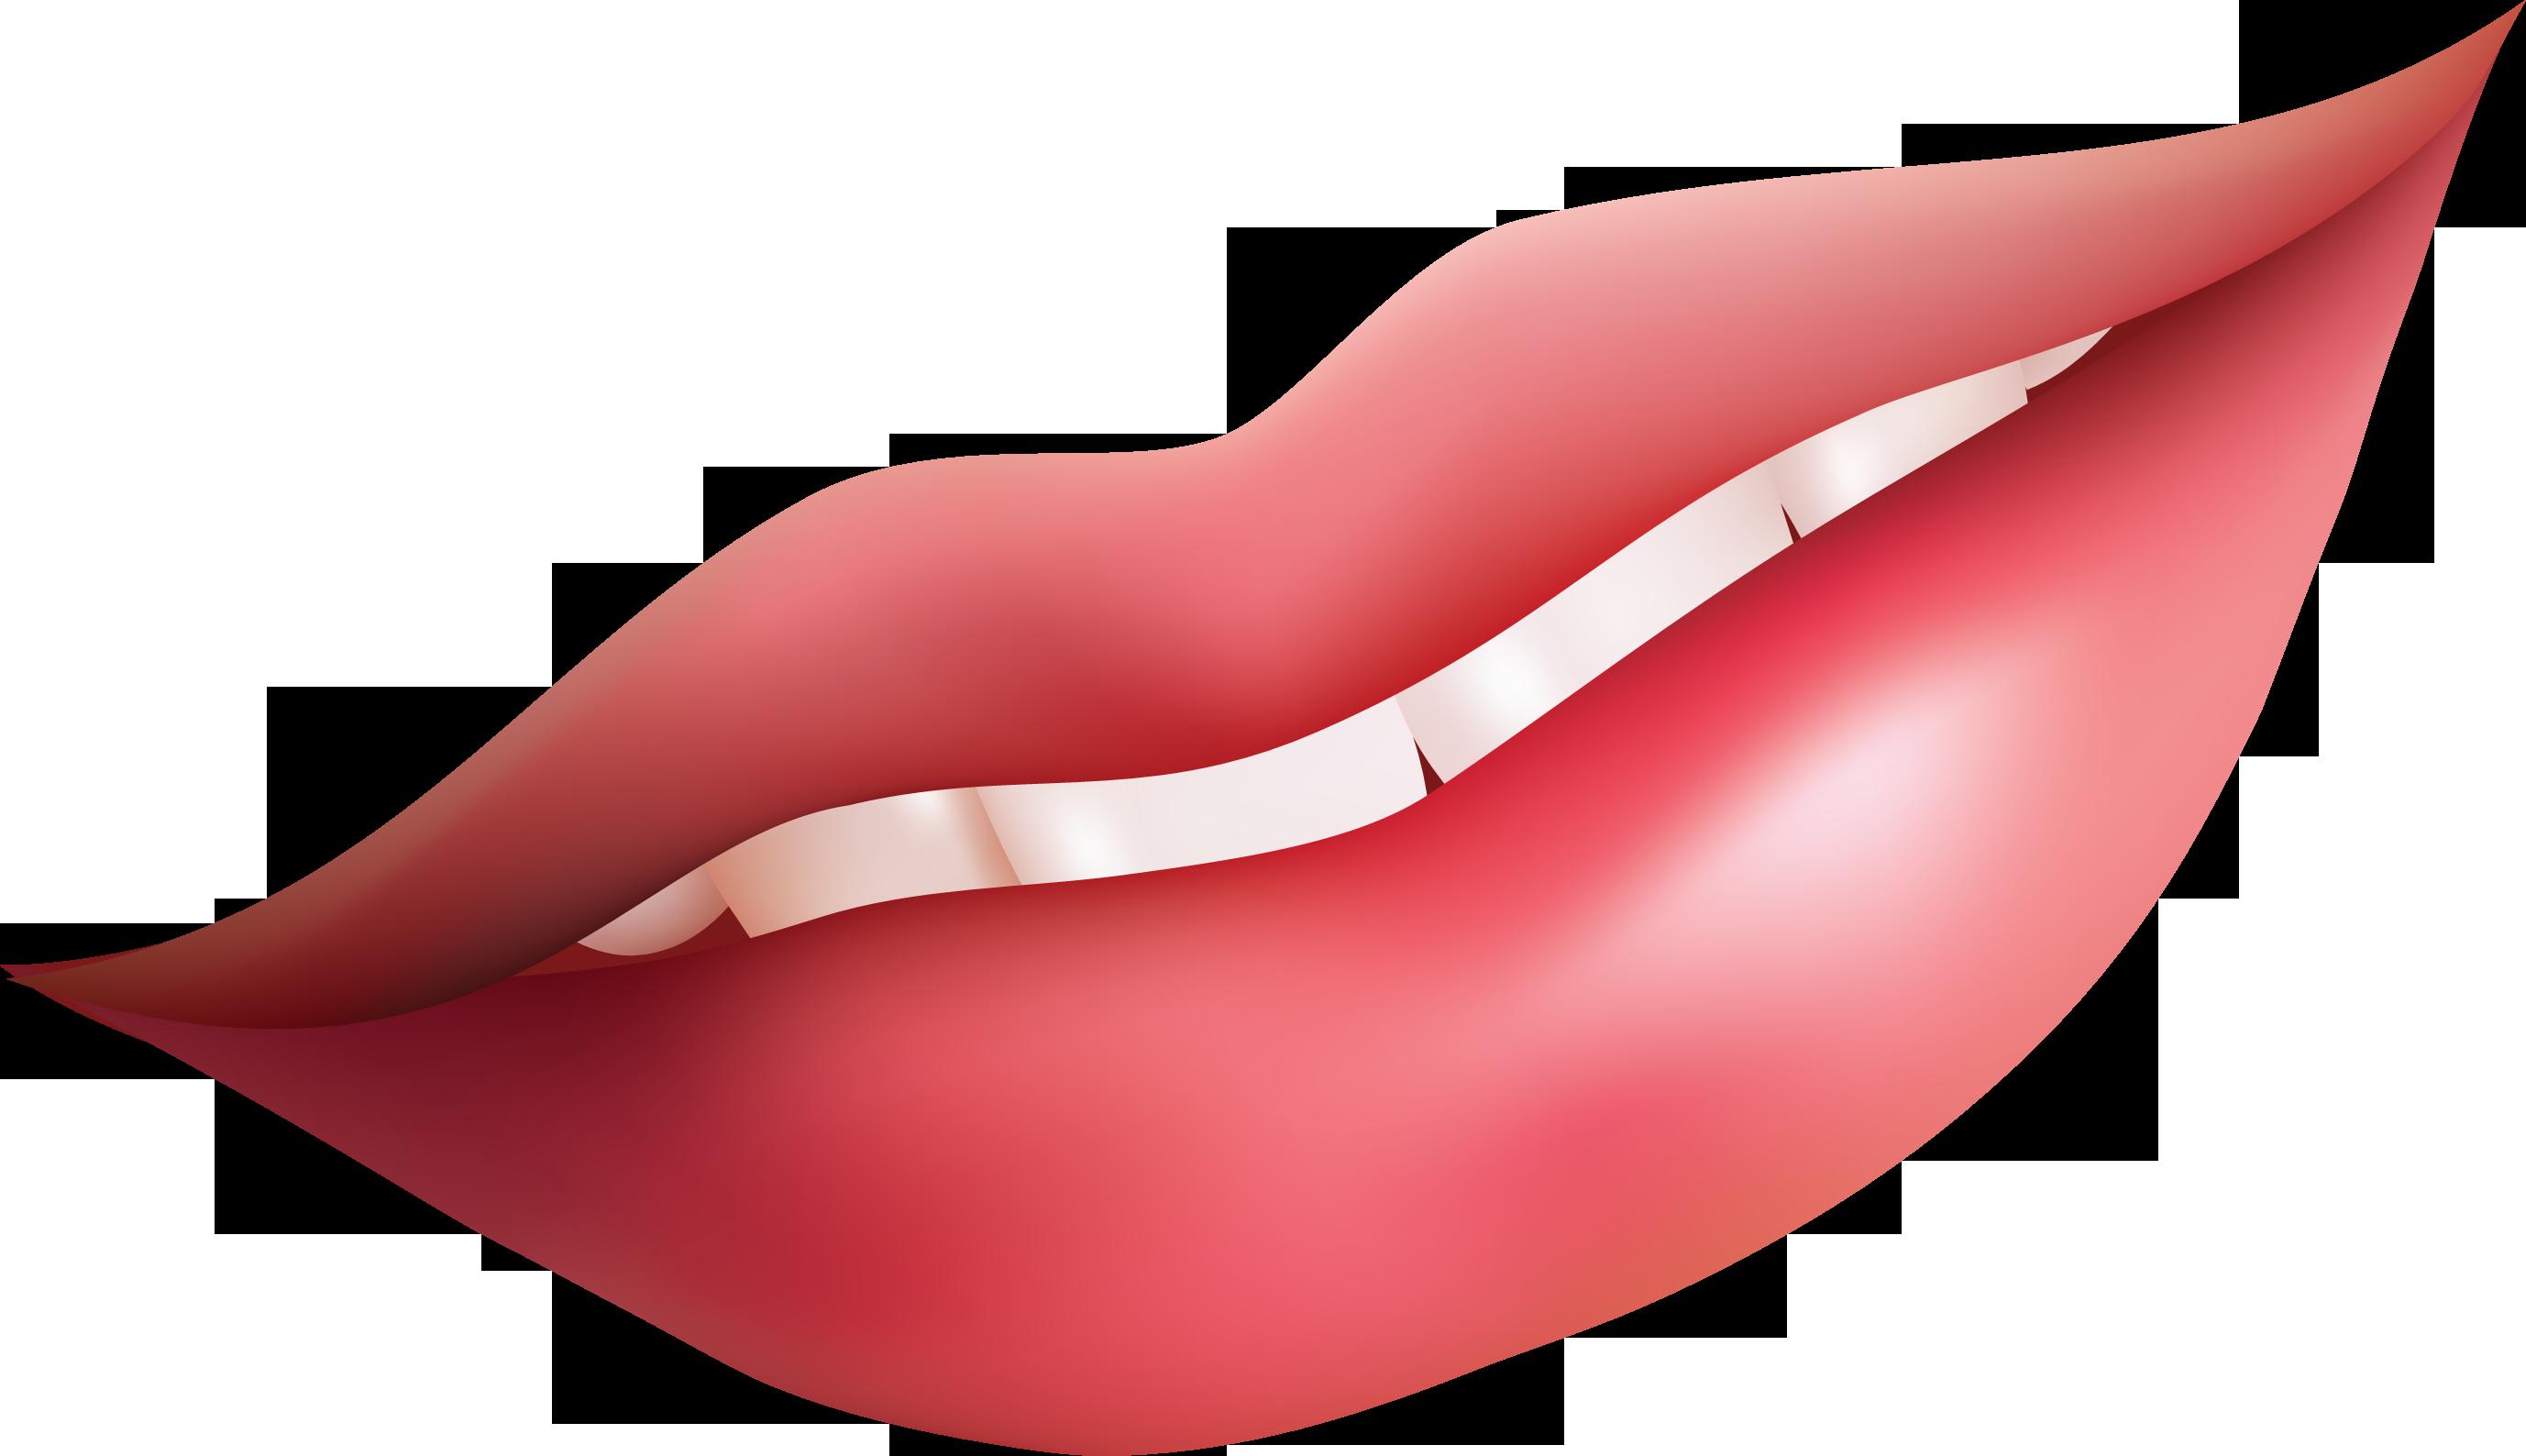 Lips PNG image - Lips HD PNG